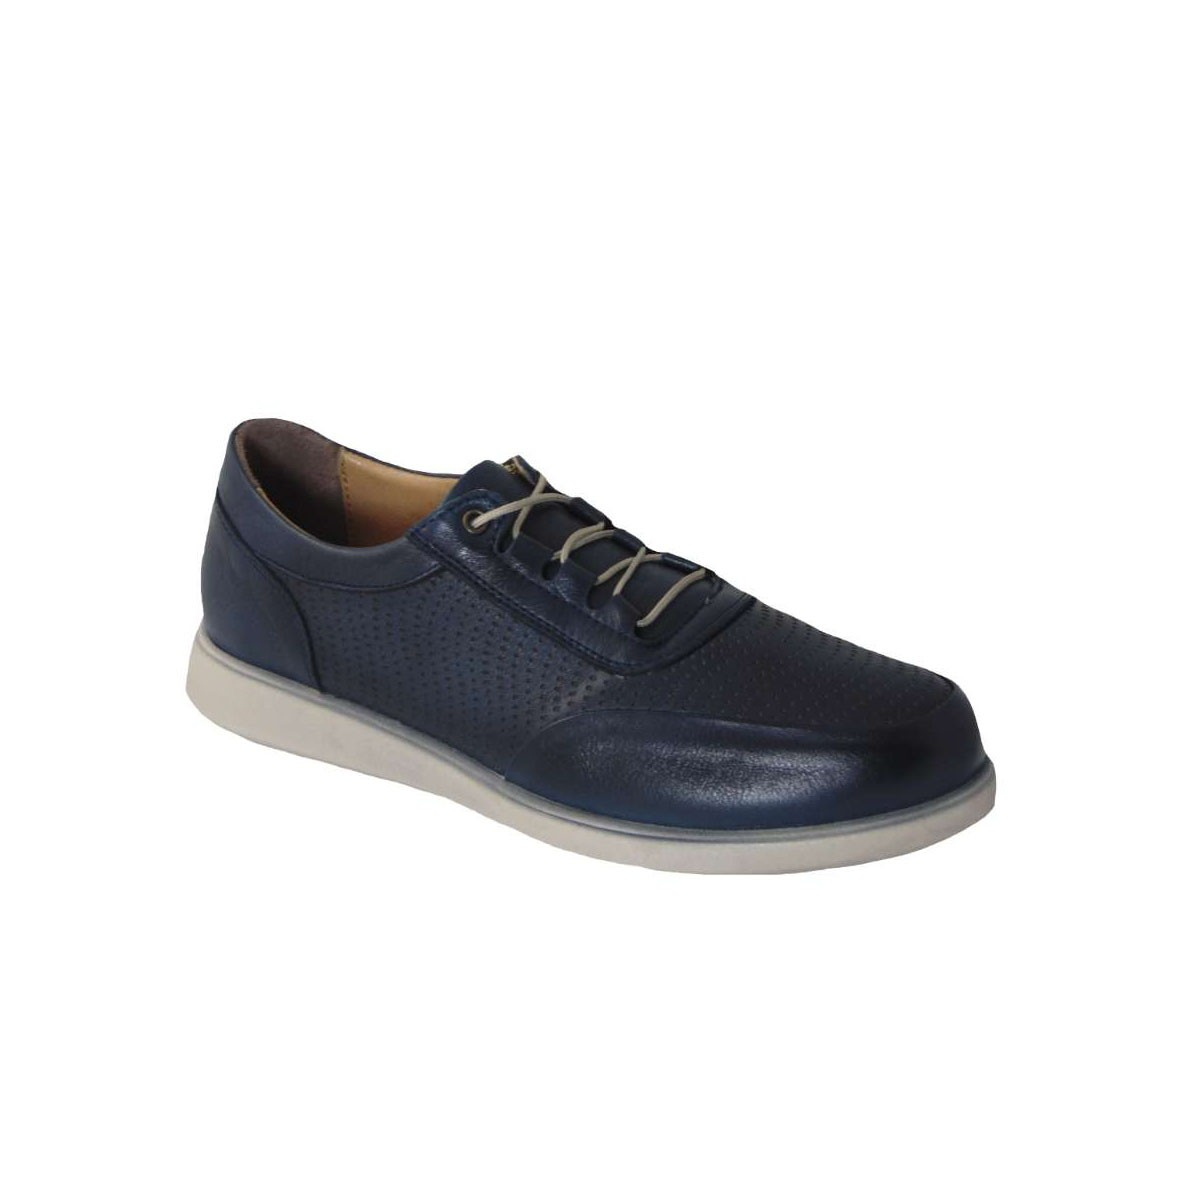 Tsimpolis Shoes 905 Ανατομικό Δερμάτινο Δετό Μπλέ